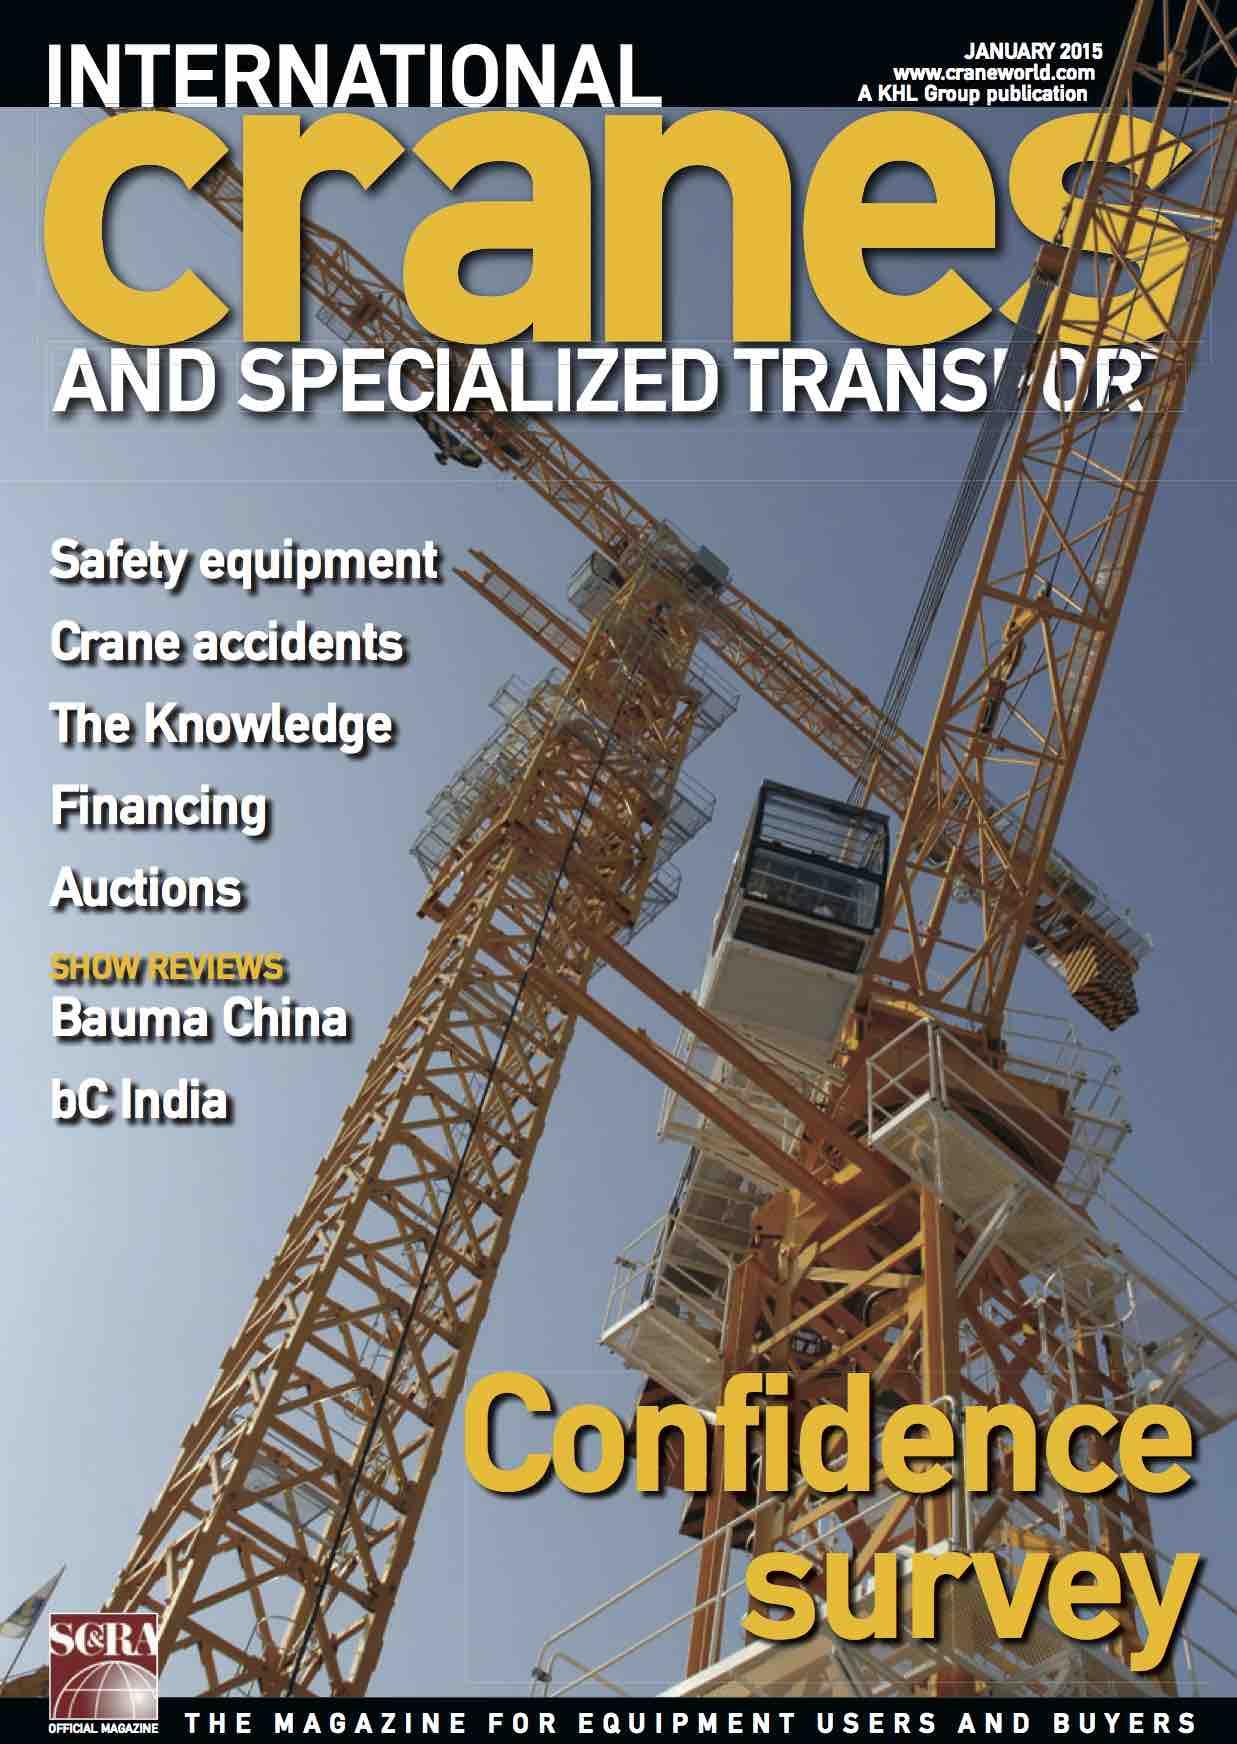 International Cranes